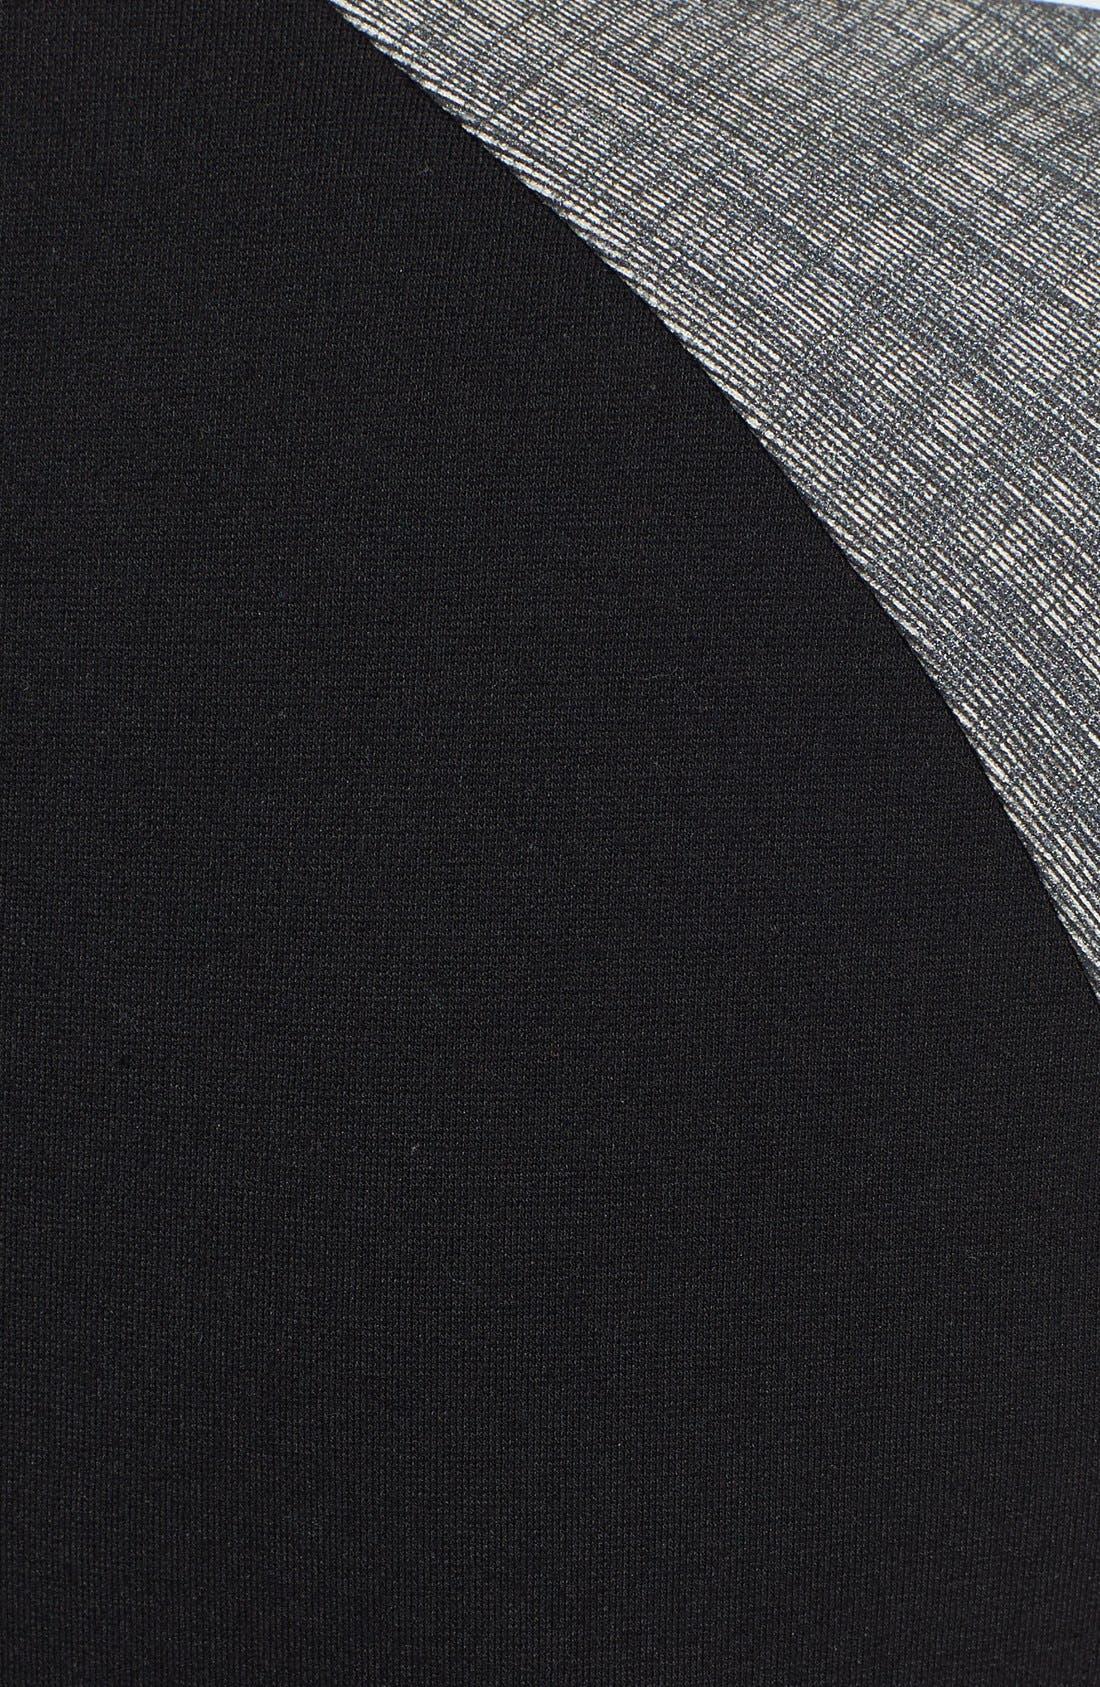 Alternate Image 3  - Lafayette 148 New York Croc Embossed Panel Punto Milano Sheath Dress